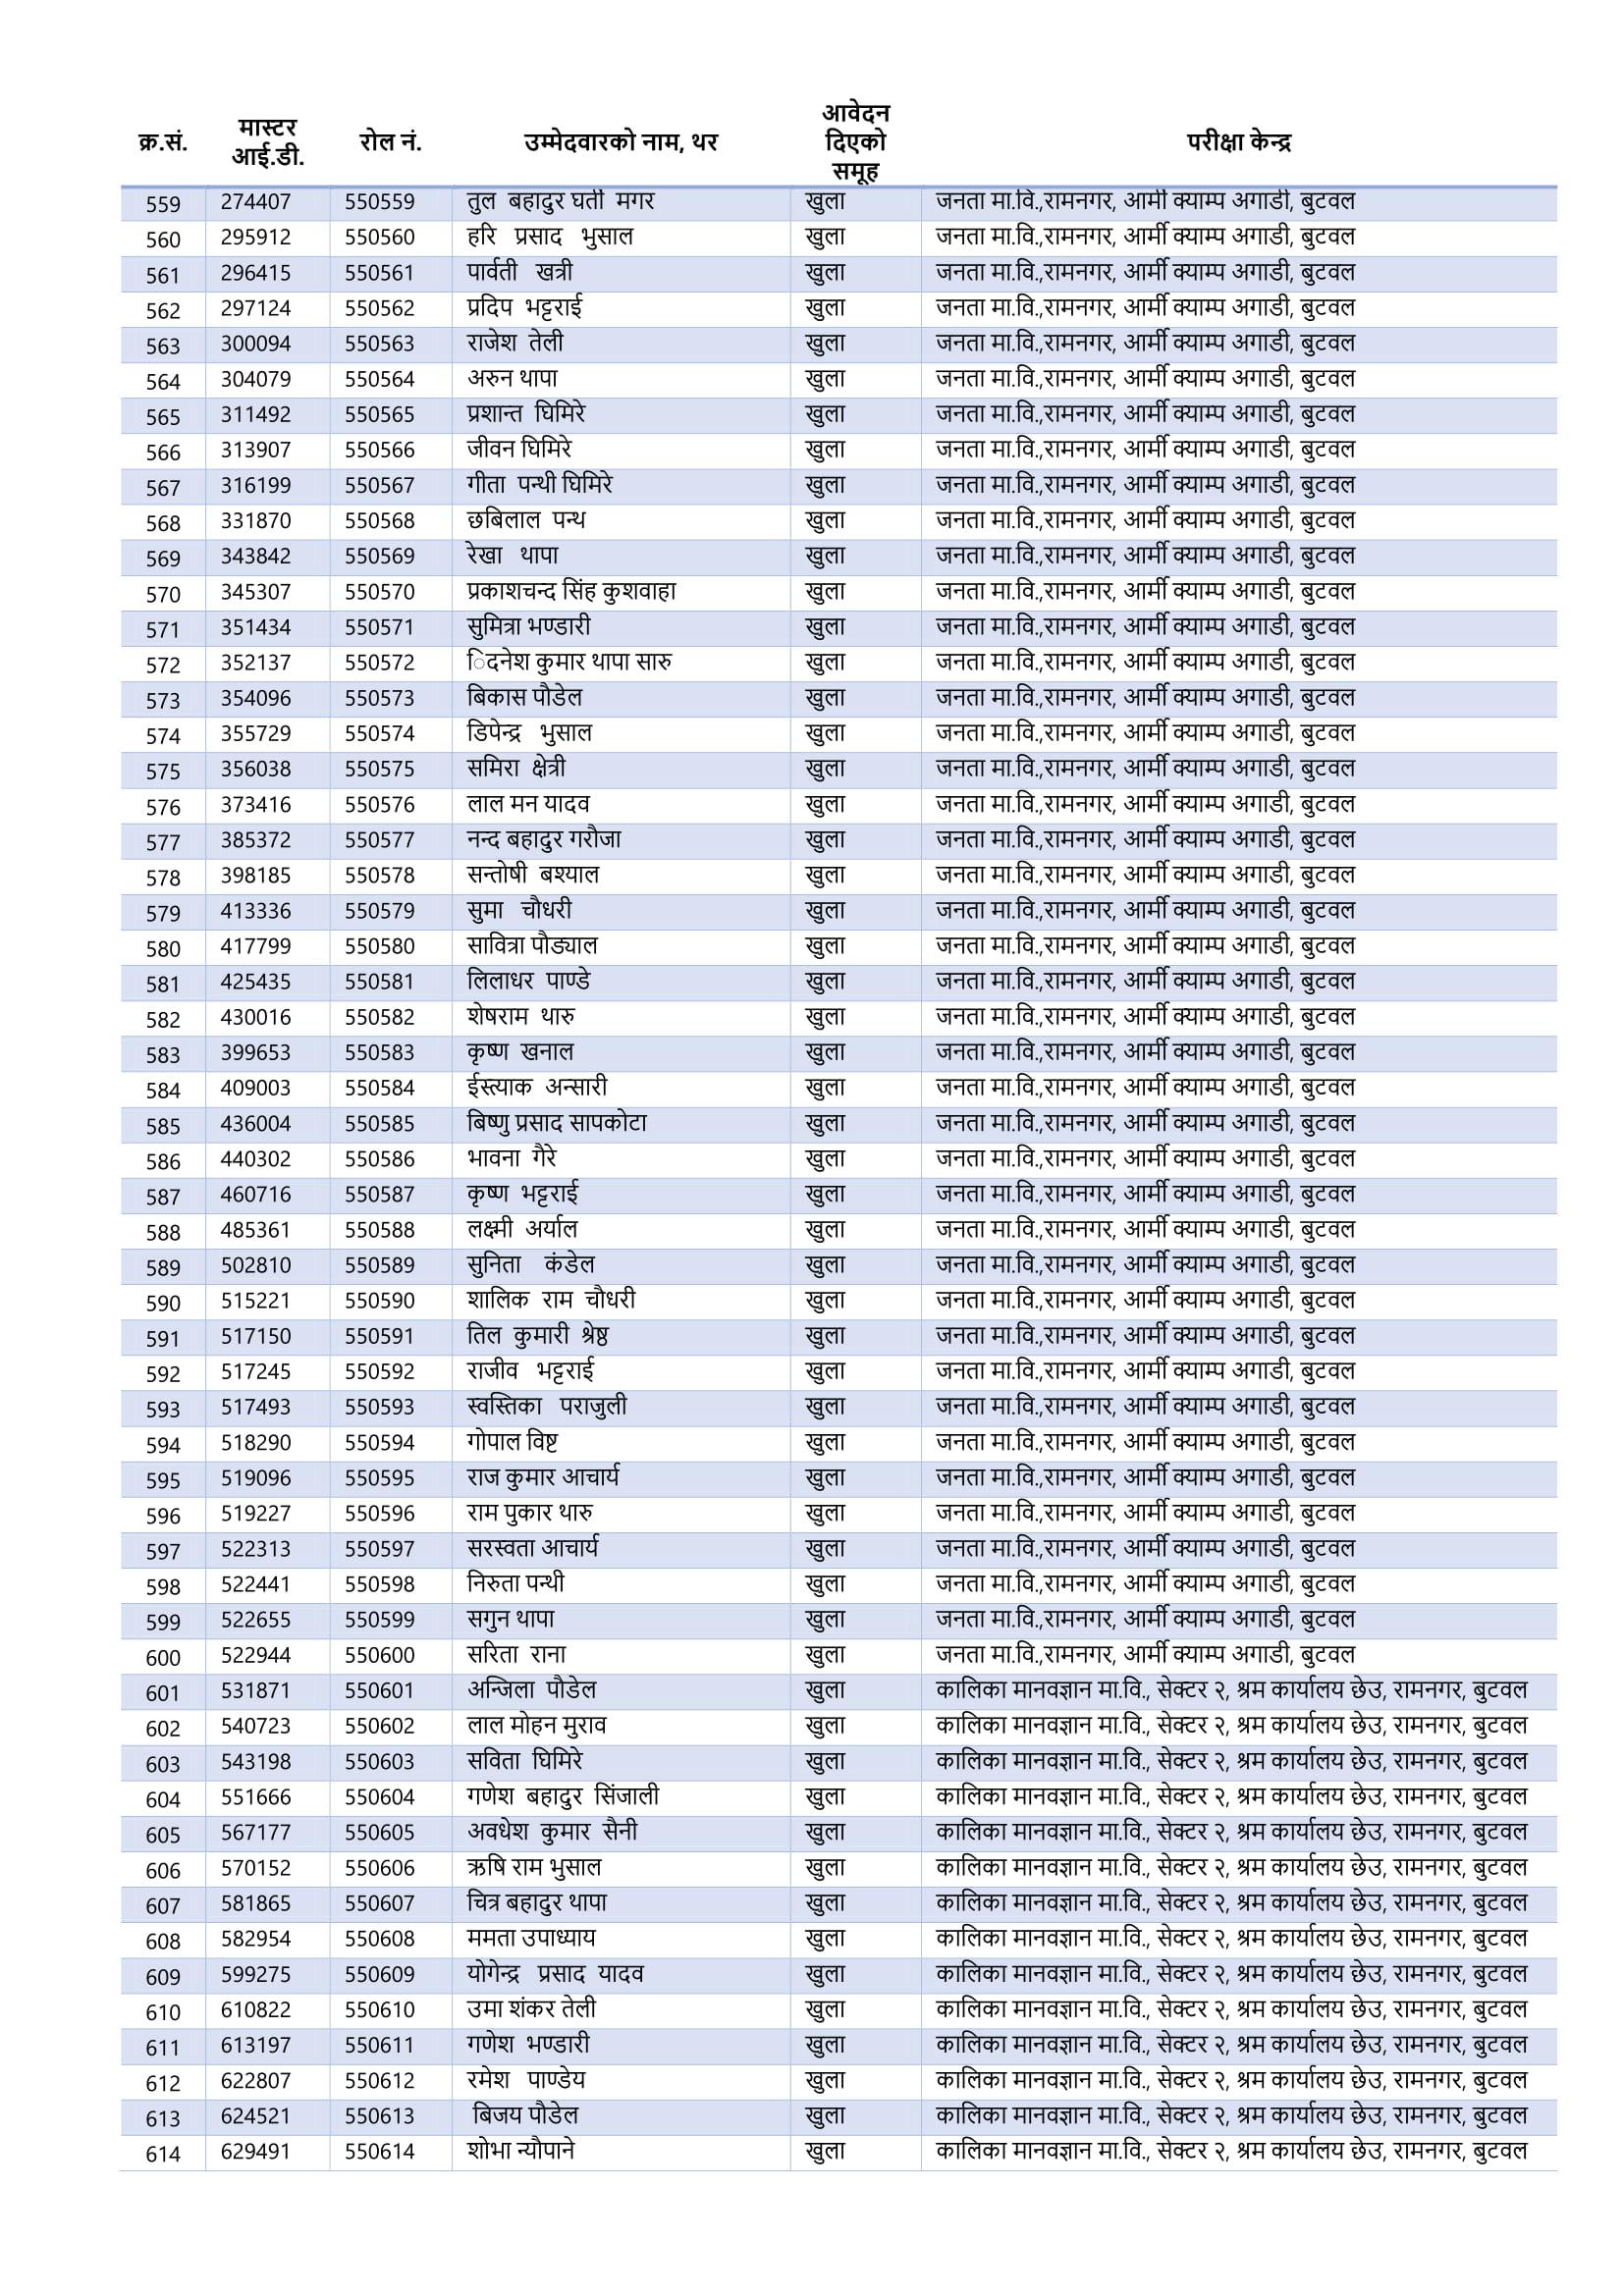 Lok Sewa Aayog Computer Operator Exam Center 2076, Lok Sewa Aayog Computer Operator Exam Center, Computer Operator Exam Center Khotang, Computer Operator Exam Center Pokhara, Computer Operator Exam Center Kathmandu, Computer Operator Exam Center Butawal, Computer Operator Exam Center Ilam, Computer Operator Exam Center Dhnakuta, Computer Operator Exam Center Jaleshwar, Computer Operator Exam Center Dipayal, Computer Operator Exam Center dang, Computer Operator Exam Center Hetauda, Computer Operator Exam Center Jumla, Computer Operator Exam Center Mahendranagar, Lok Sewa Computer Operator Exam Center Khotang, Lok Sewa Computer Operator Exam Center Pokhara, Lok Sewa Computer Operator Exam Center Kathmandu, Lok Sewa Computer Operator Exam Center Butawal, Lok Sewa Computer Operator Exam Center Ilam, Lok Sewa Computer Operator Exam Center Dhnakuta, Lok Sewa Computer Operator Exam Center Jaleshwar, Lok Sewa Computer Operator Exam Center Dipayal, Lok Sewa Computer Operator Exam Center dang, Lok Sewa Computer Operator Exam Center Hetauda, Lok Sewa Computer Operator Exam Center Jumla, Lok Sewa Computer Operator Exam Center Mahendranagar, Butawal Computer Operator 5th Level exam center, Butawal Computer Operator 4th Level exam center Computer Operator 5th Level exam center Computer Operator 4th Level exam center